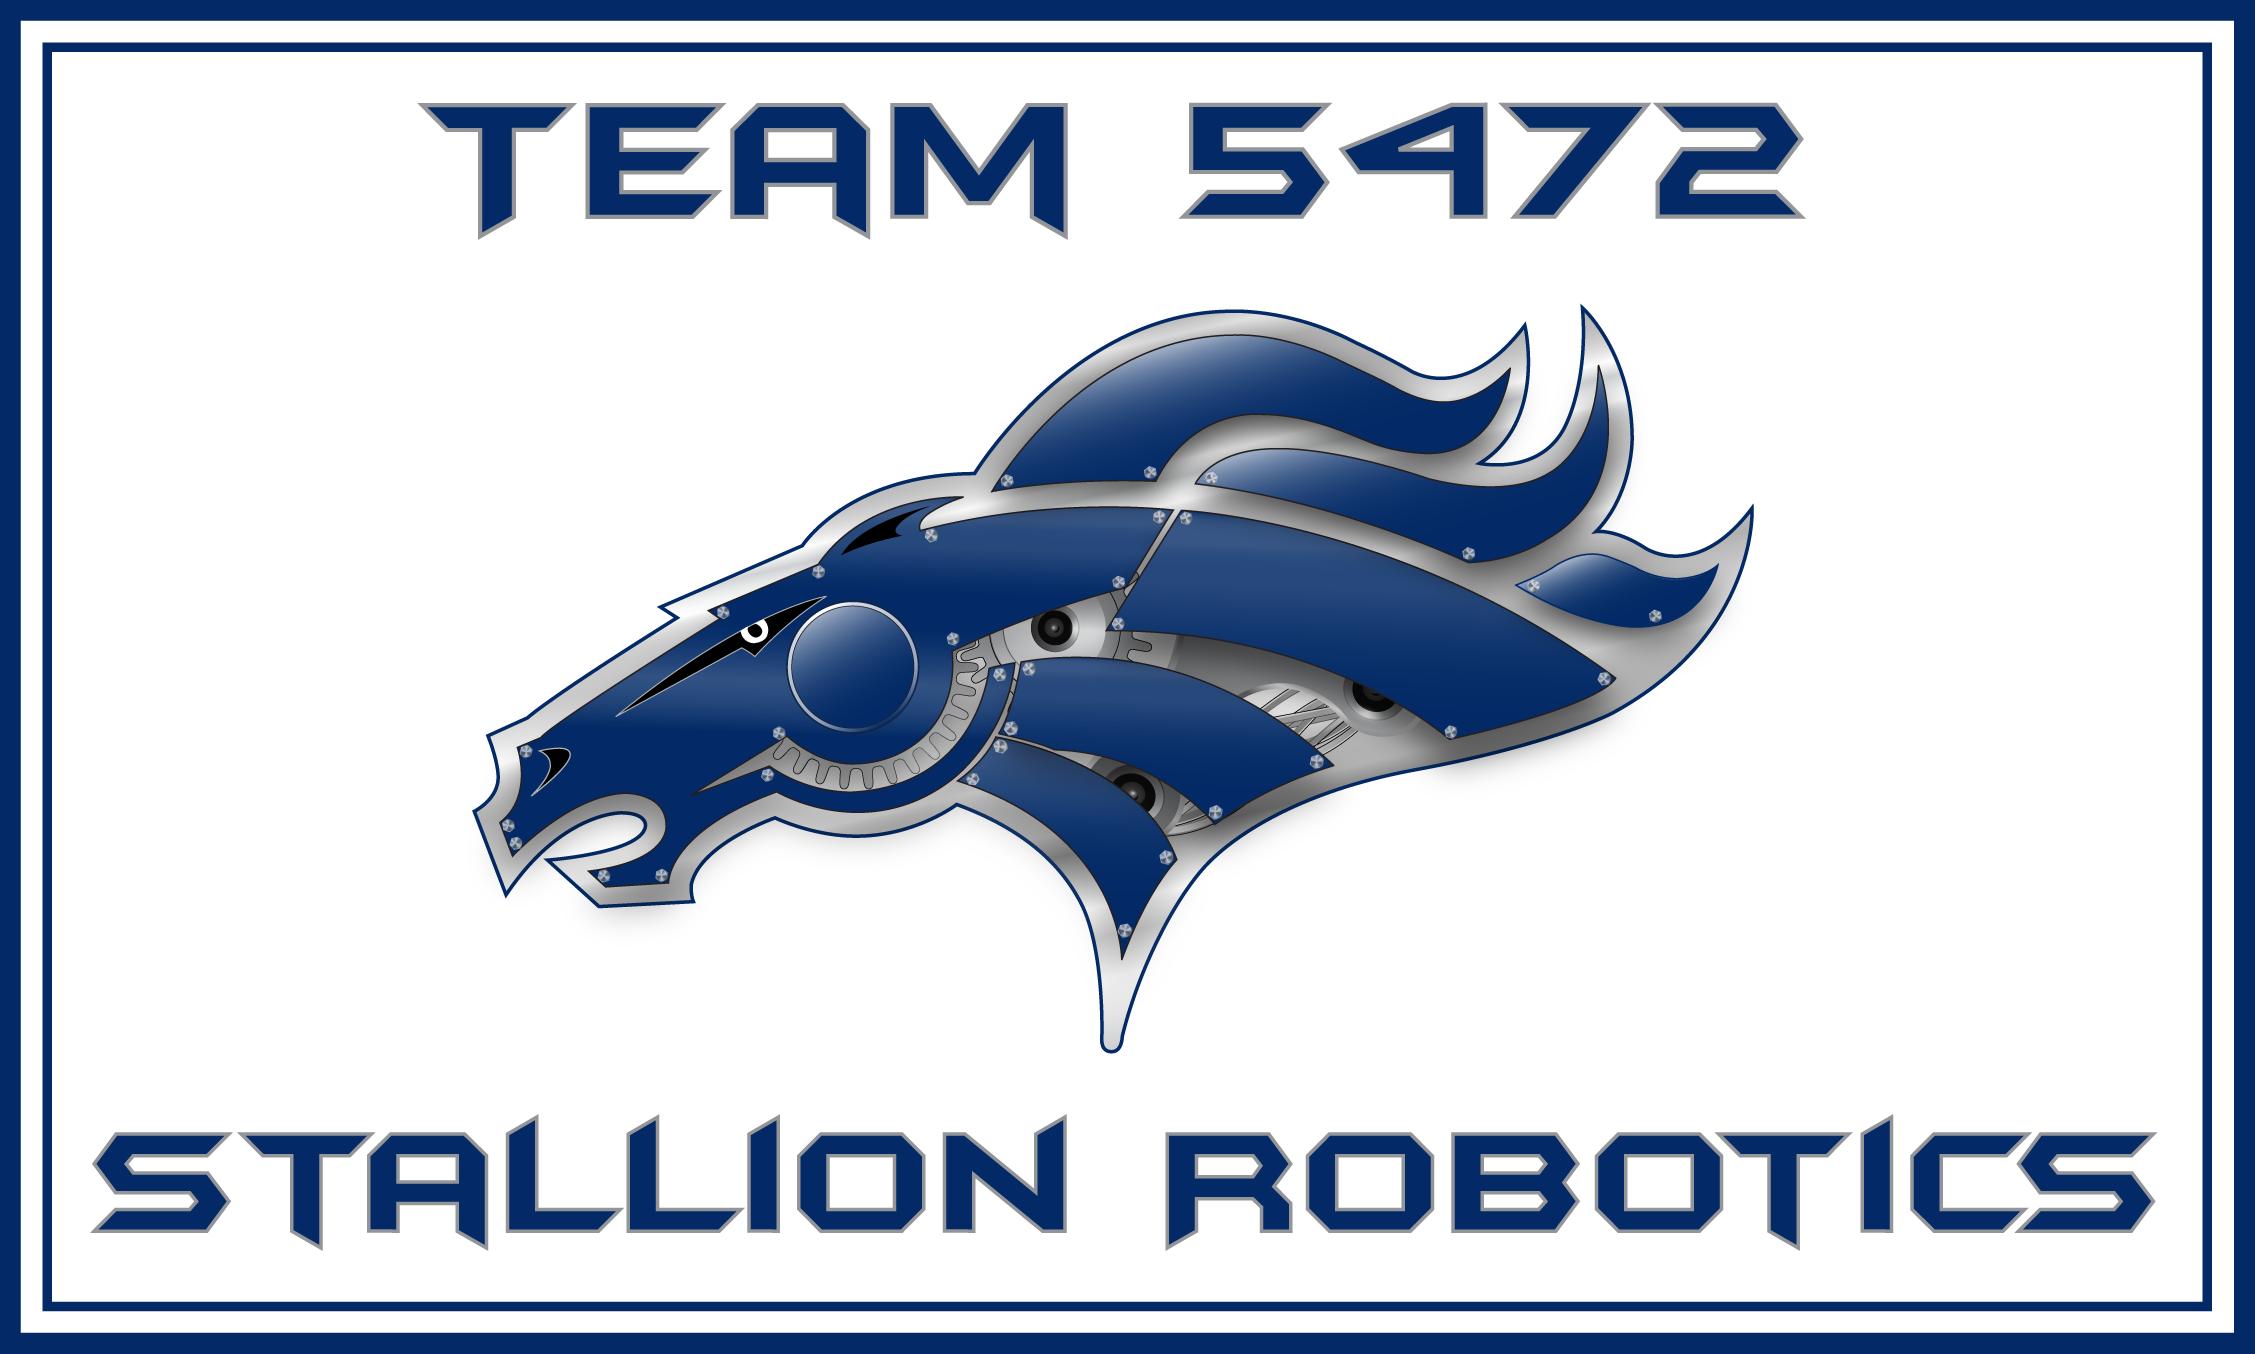 Team 5472